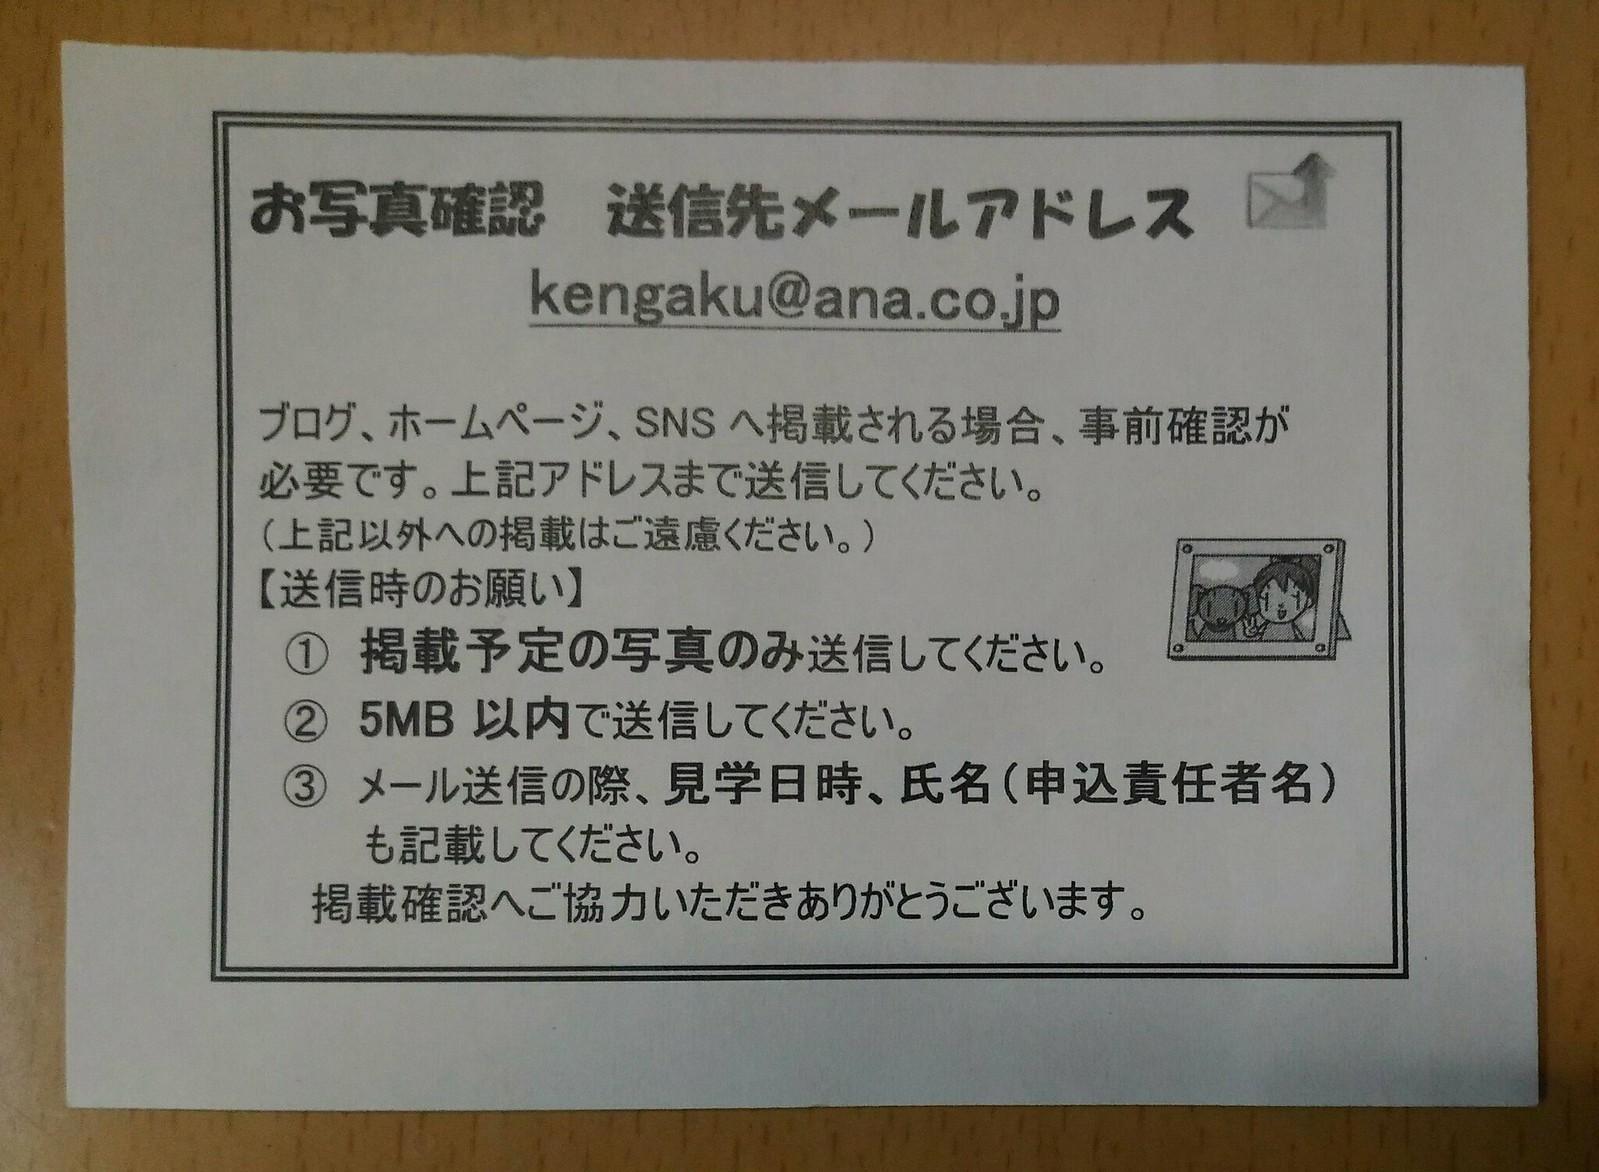 2017-05-30_08-15-59